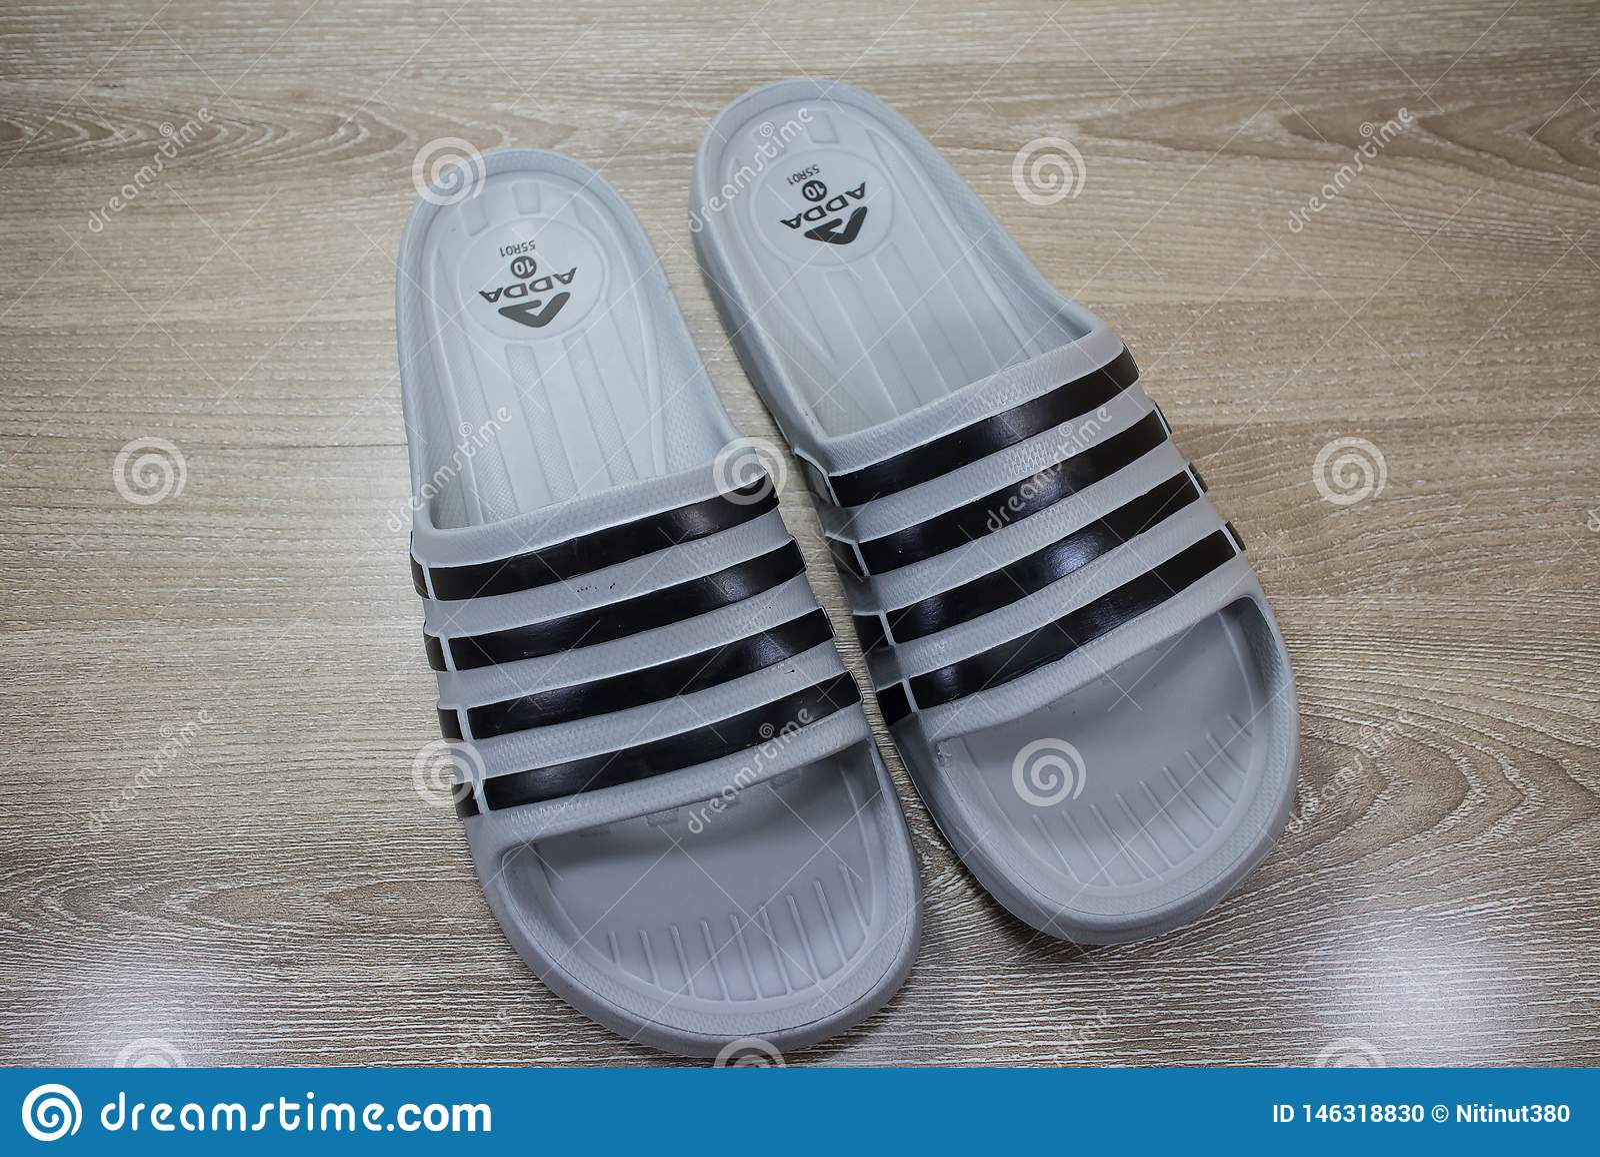 ADDA Shoe, Product of thailand